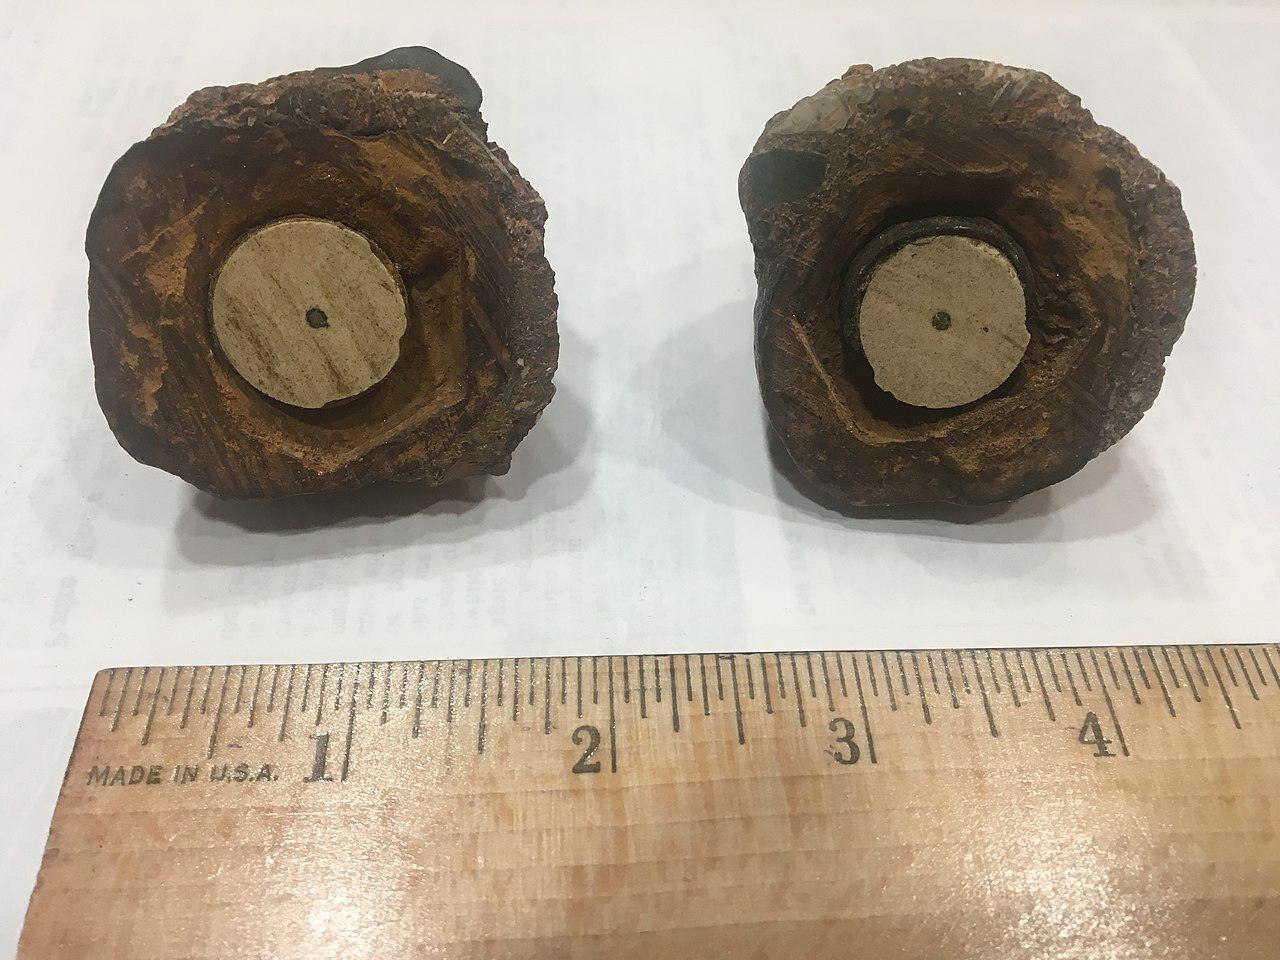 Coso Artifact